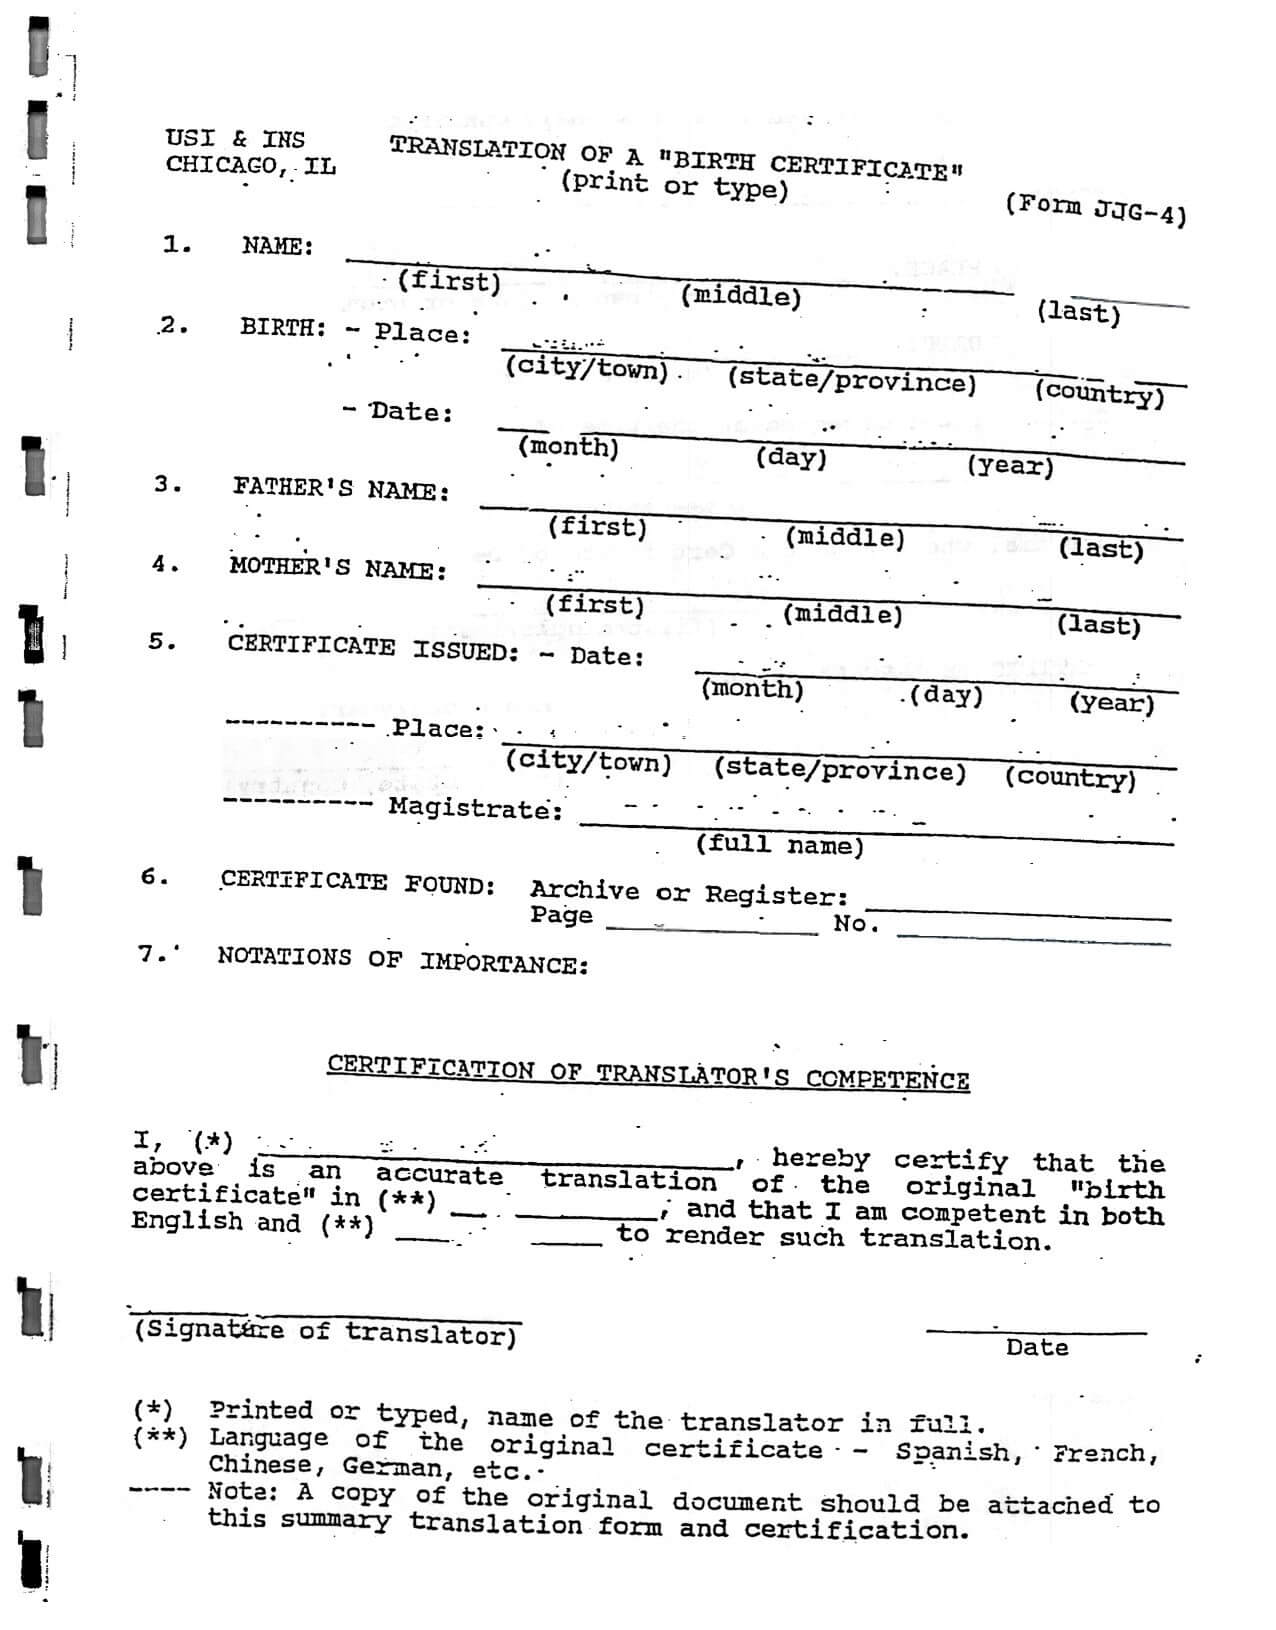 Death Certificate Translation Template Spanish To English inside Death Certificate Translation Template